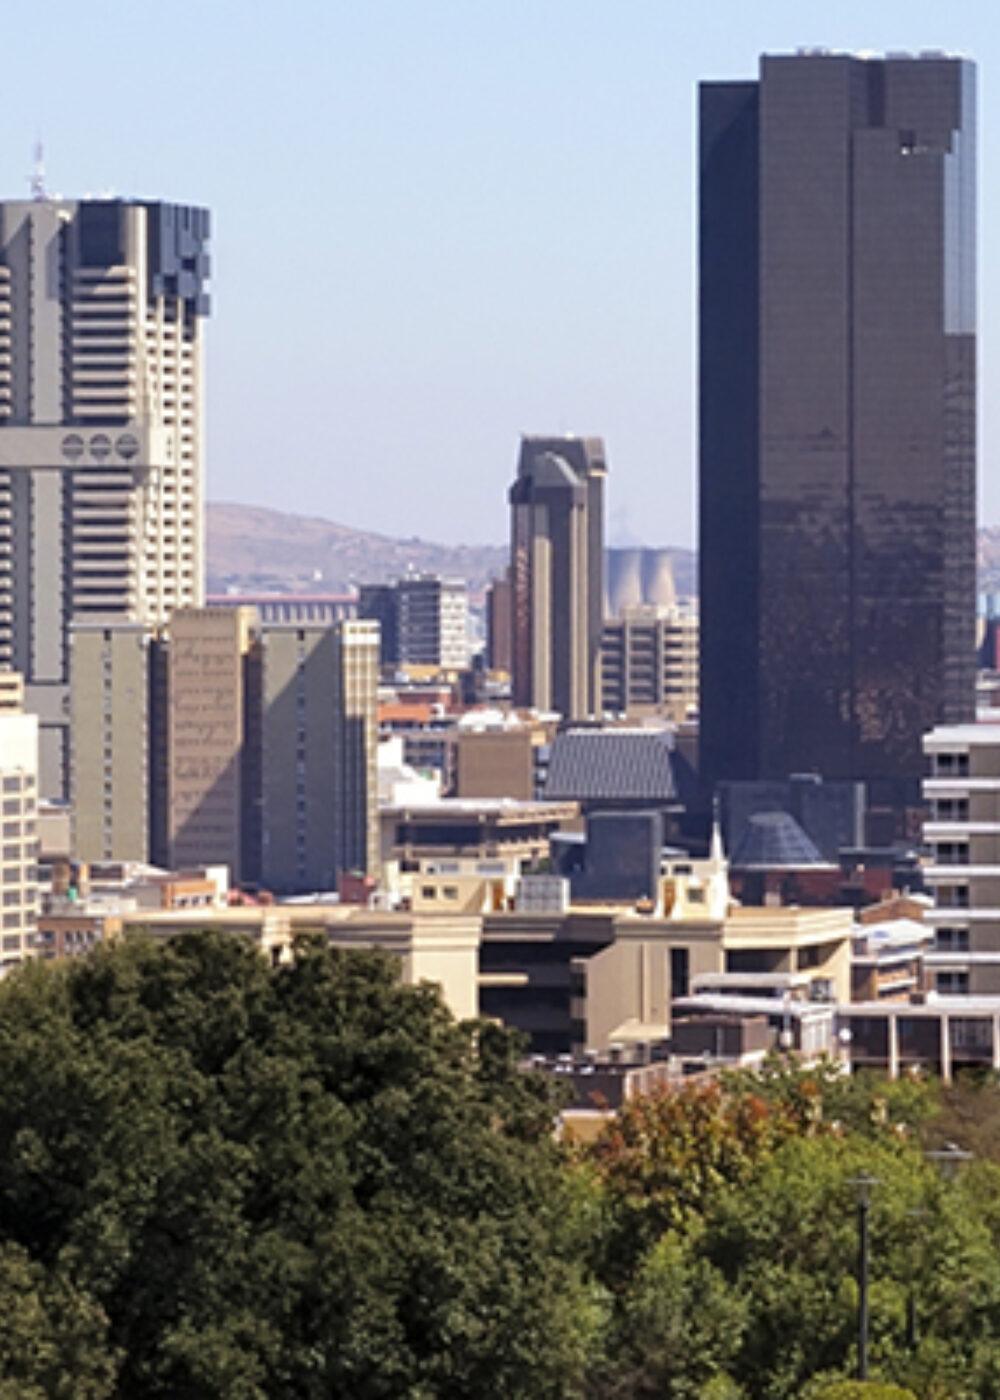 Green Motion Car Rental South Africa Pretoria Downtown 1440x400